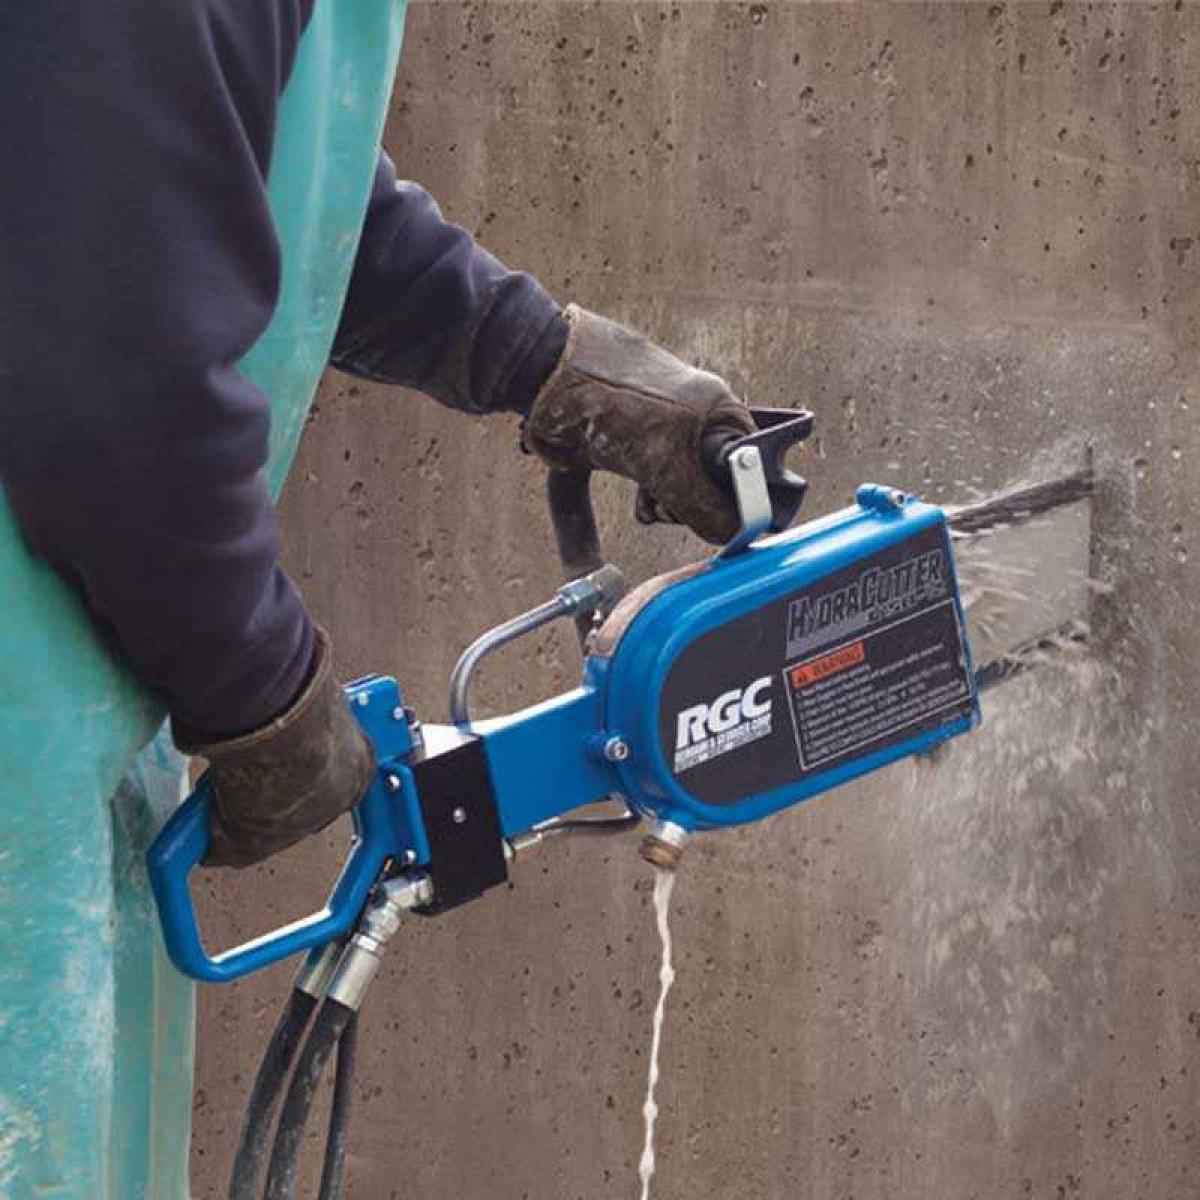 rgc hydra tool